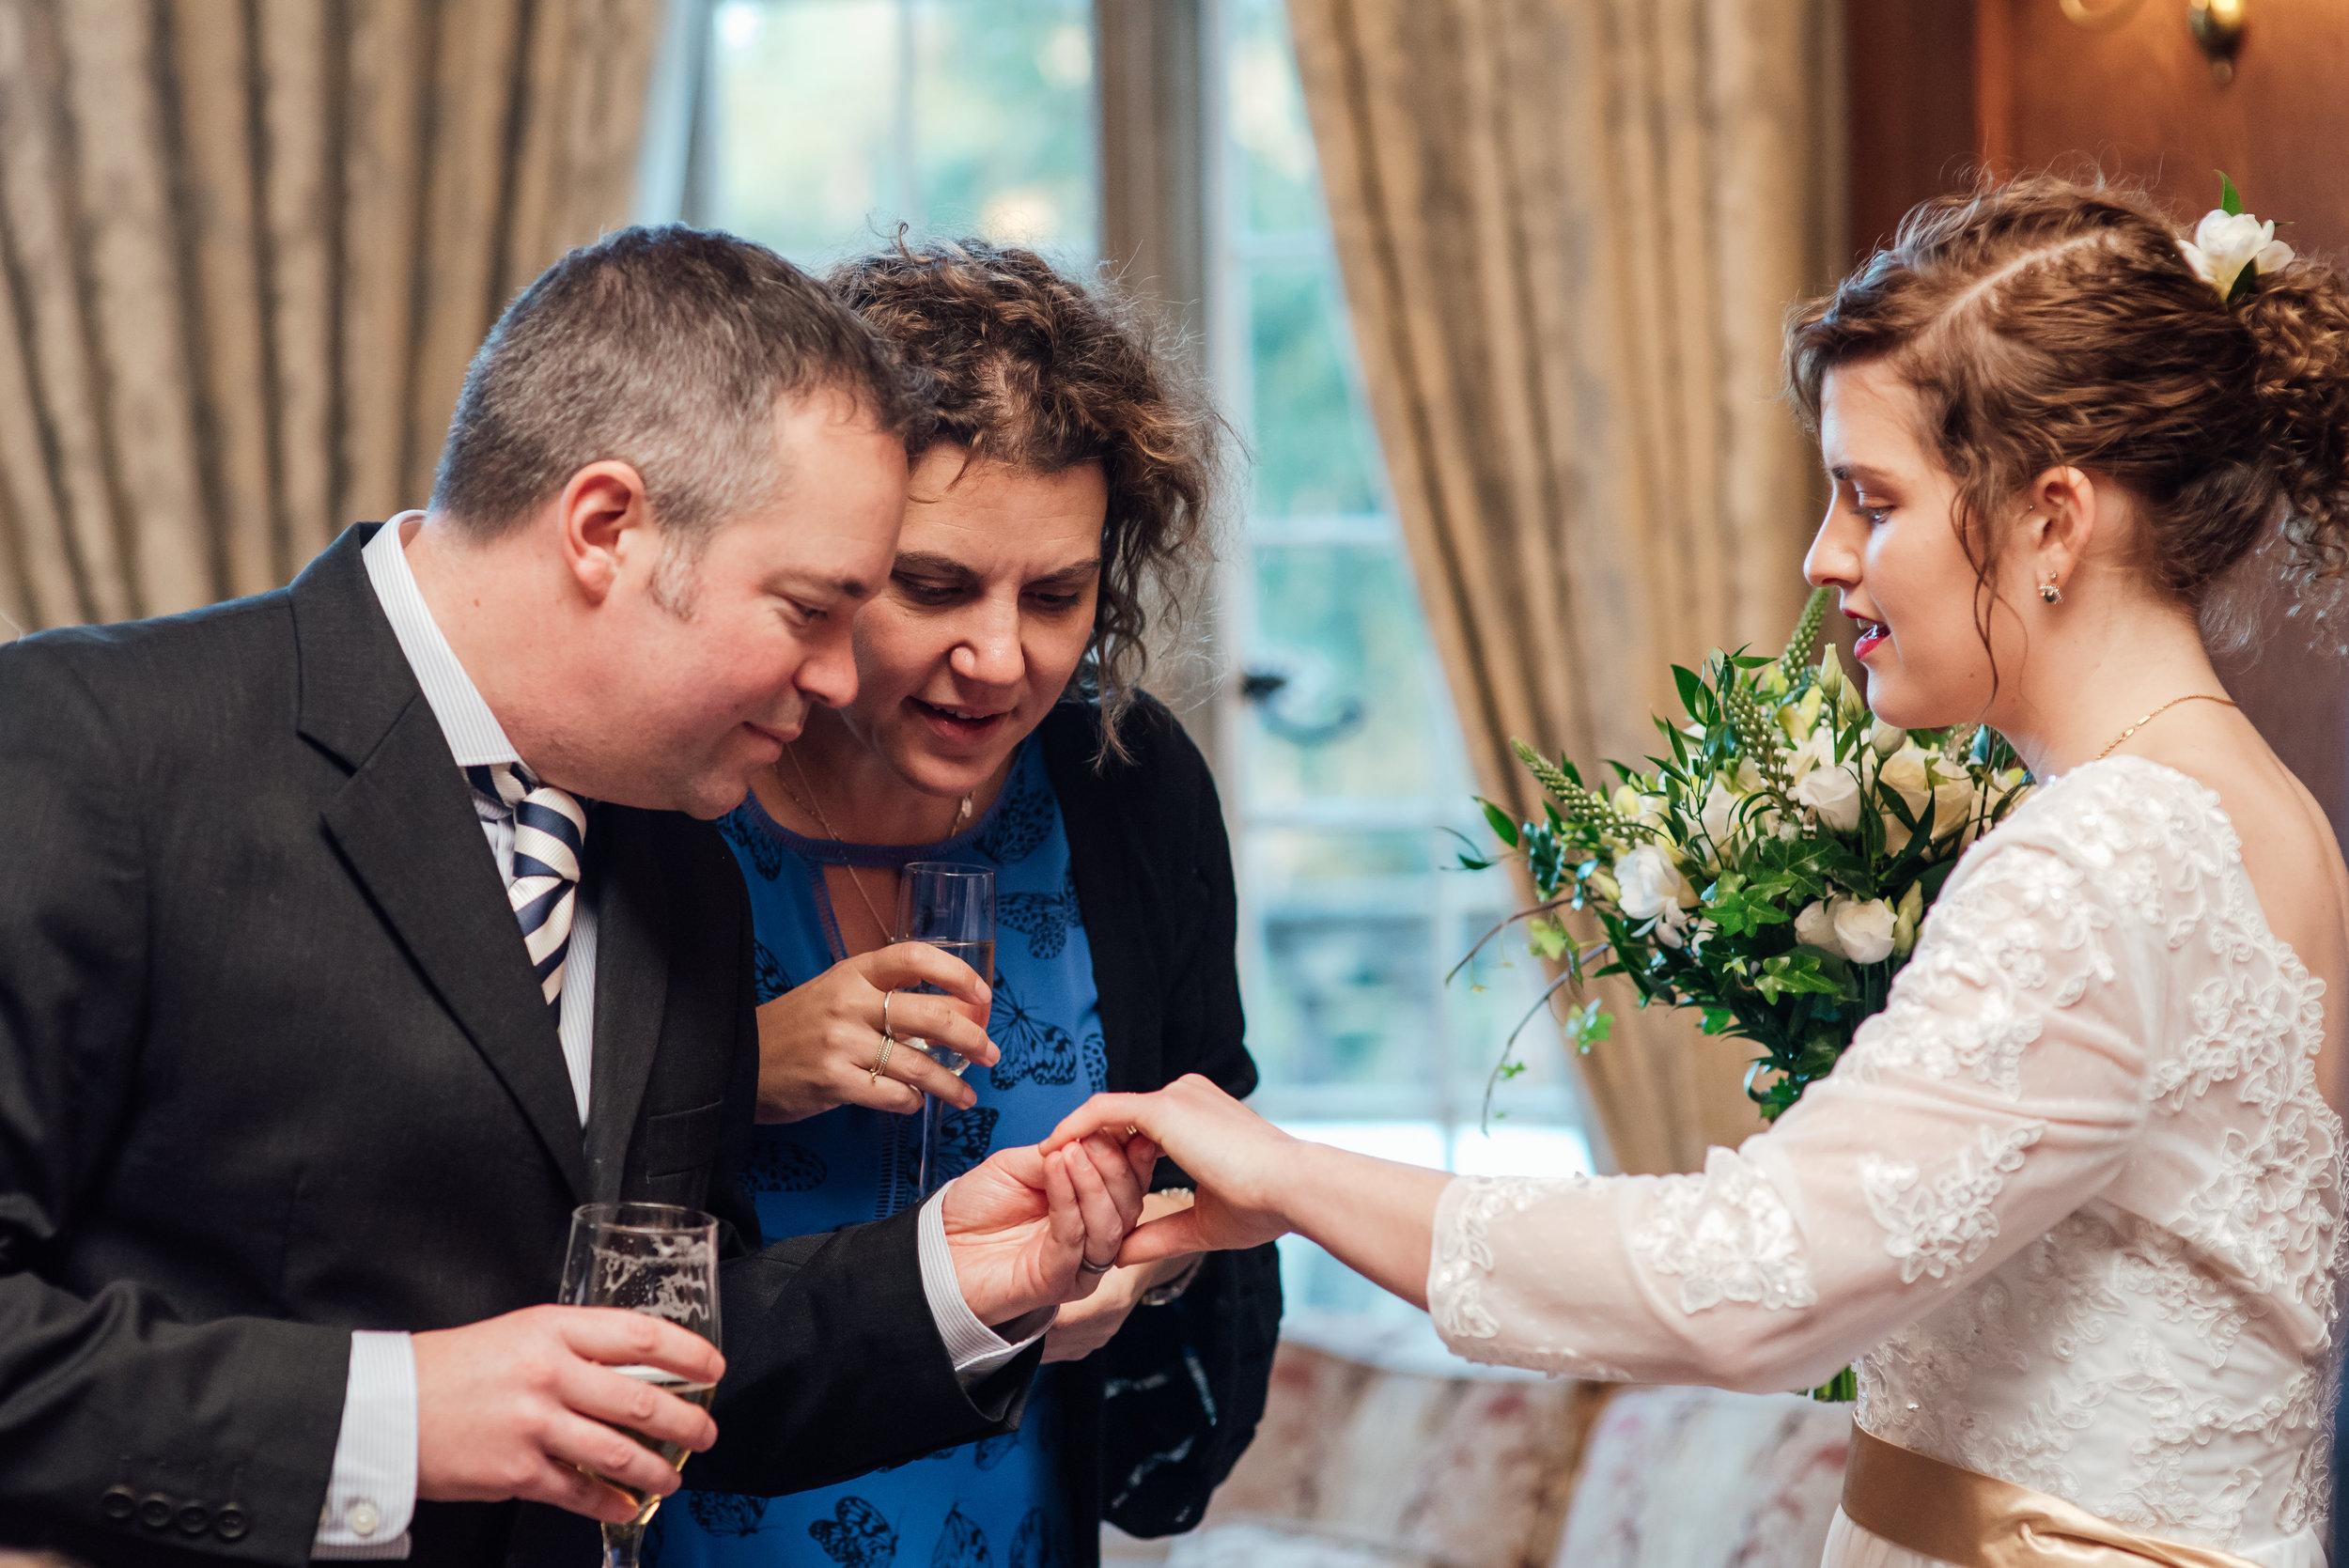 Hampshire-wedding-photographer-hampshire : Amy-James-Photography : Tylney-Hall-Wedding : Tyleny-Hall-Wedding-Photographer : Hampshire-wedding-venue : Fleet-wedding-photographer-farnborough-485.jpg